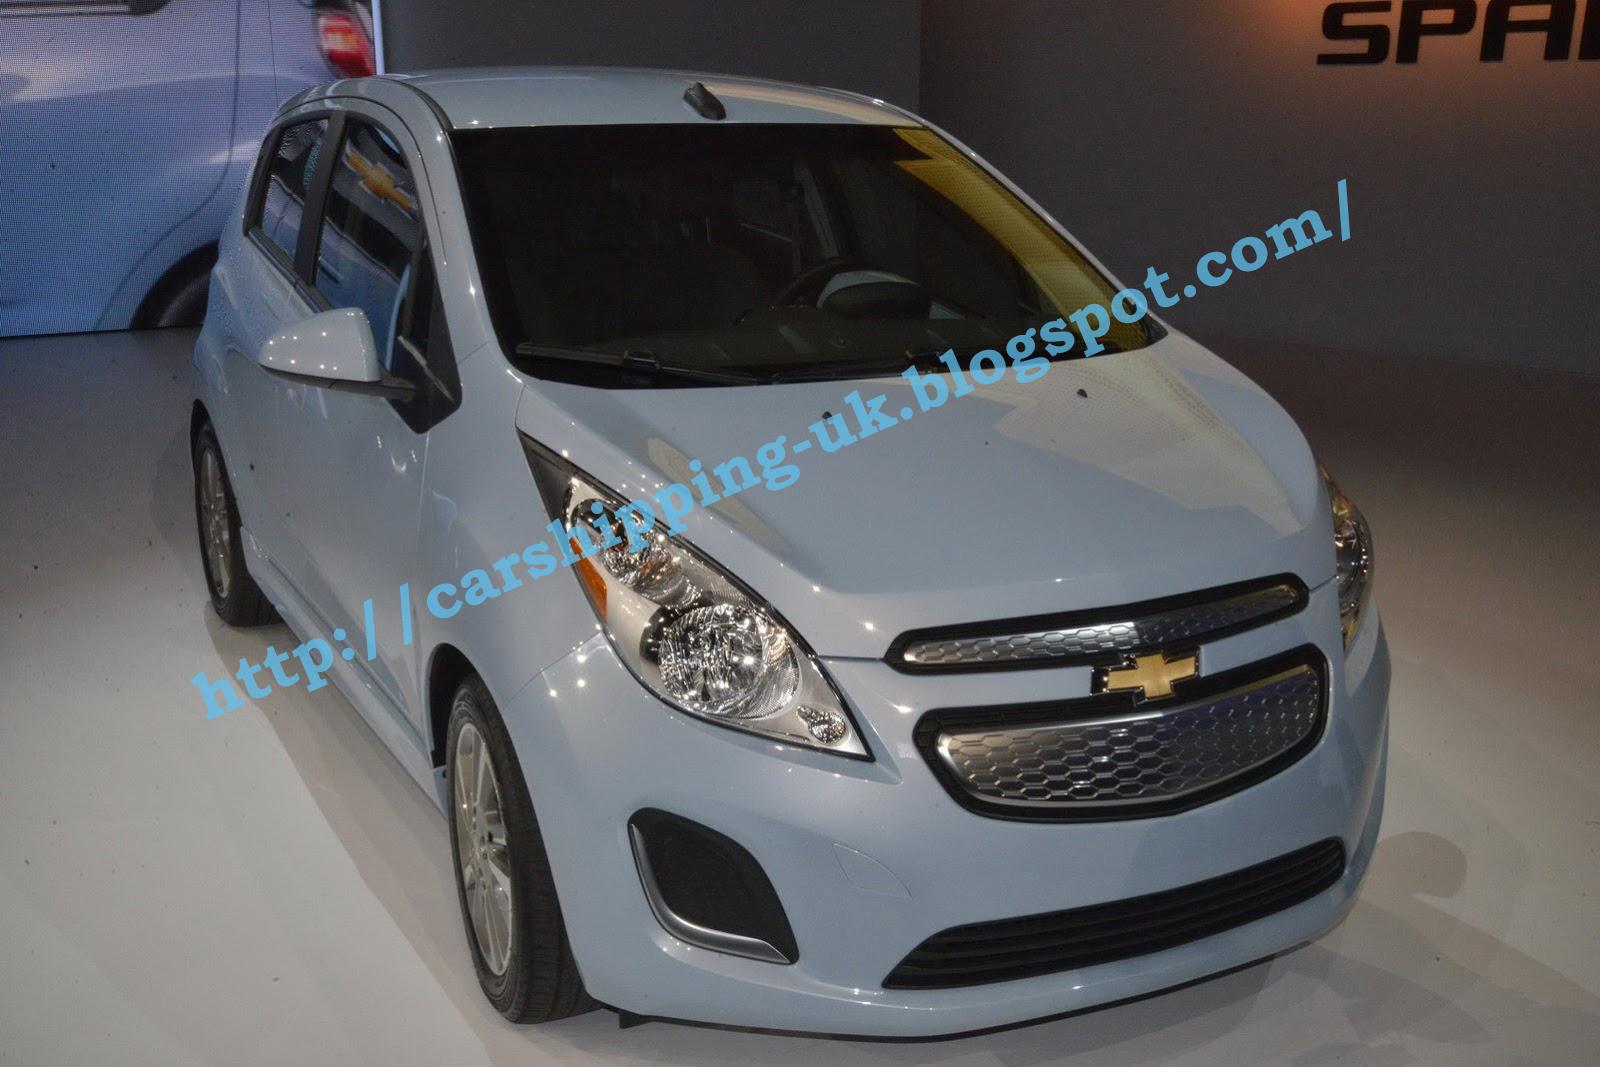 Auto Transport Quotes Auto Transport Quotes Car Shipping Auto Transport Car